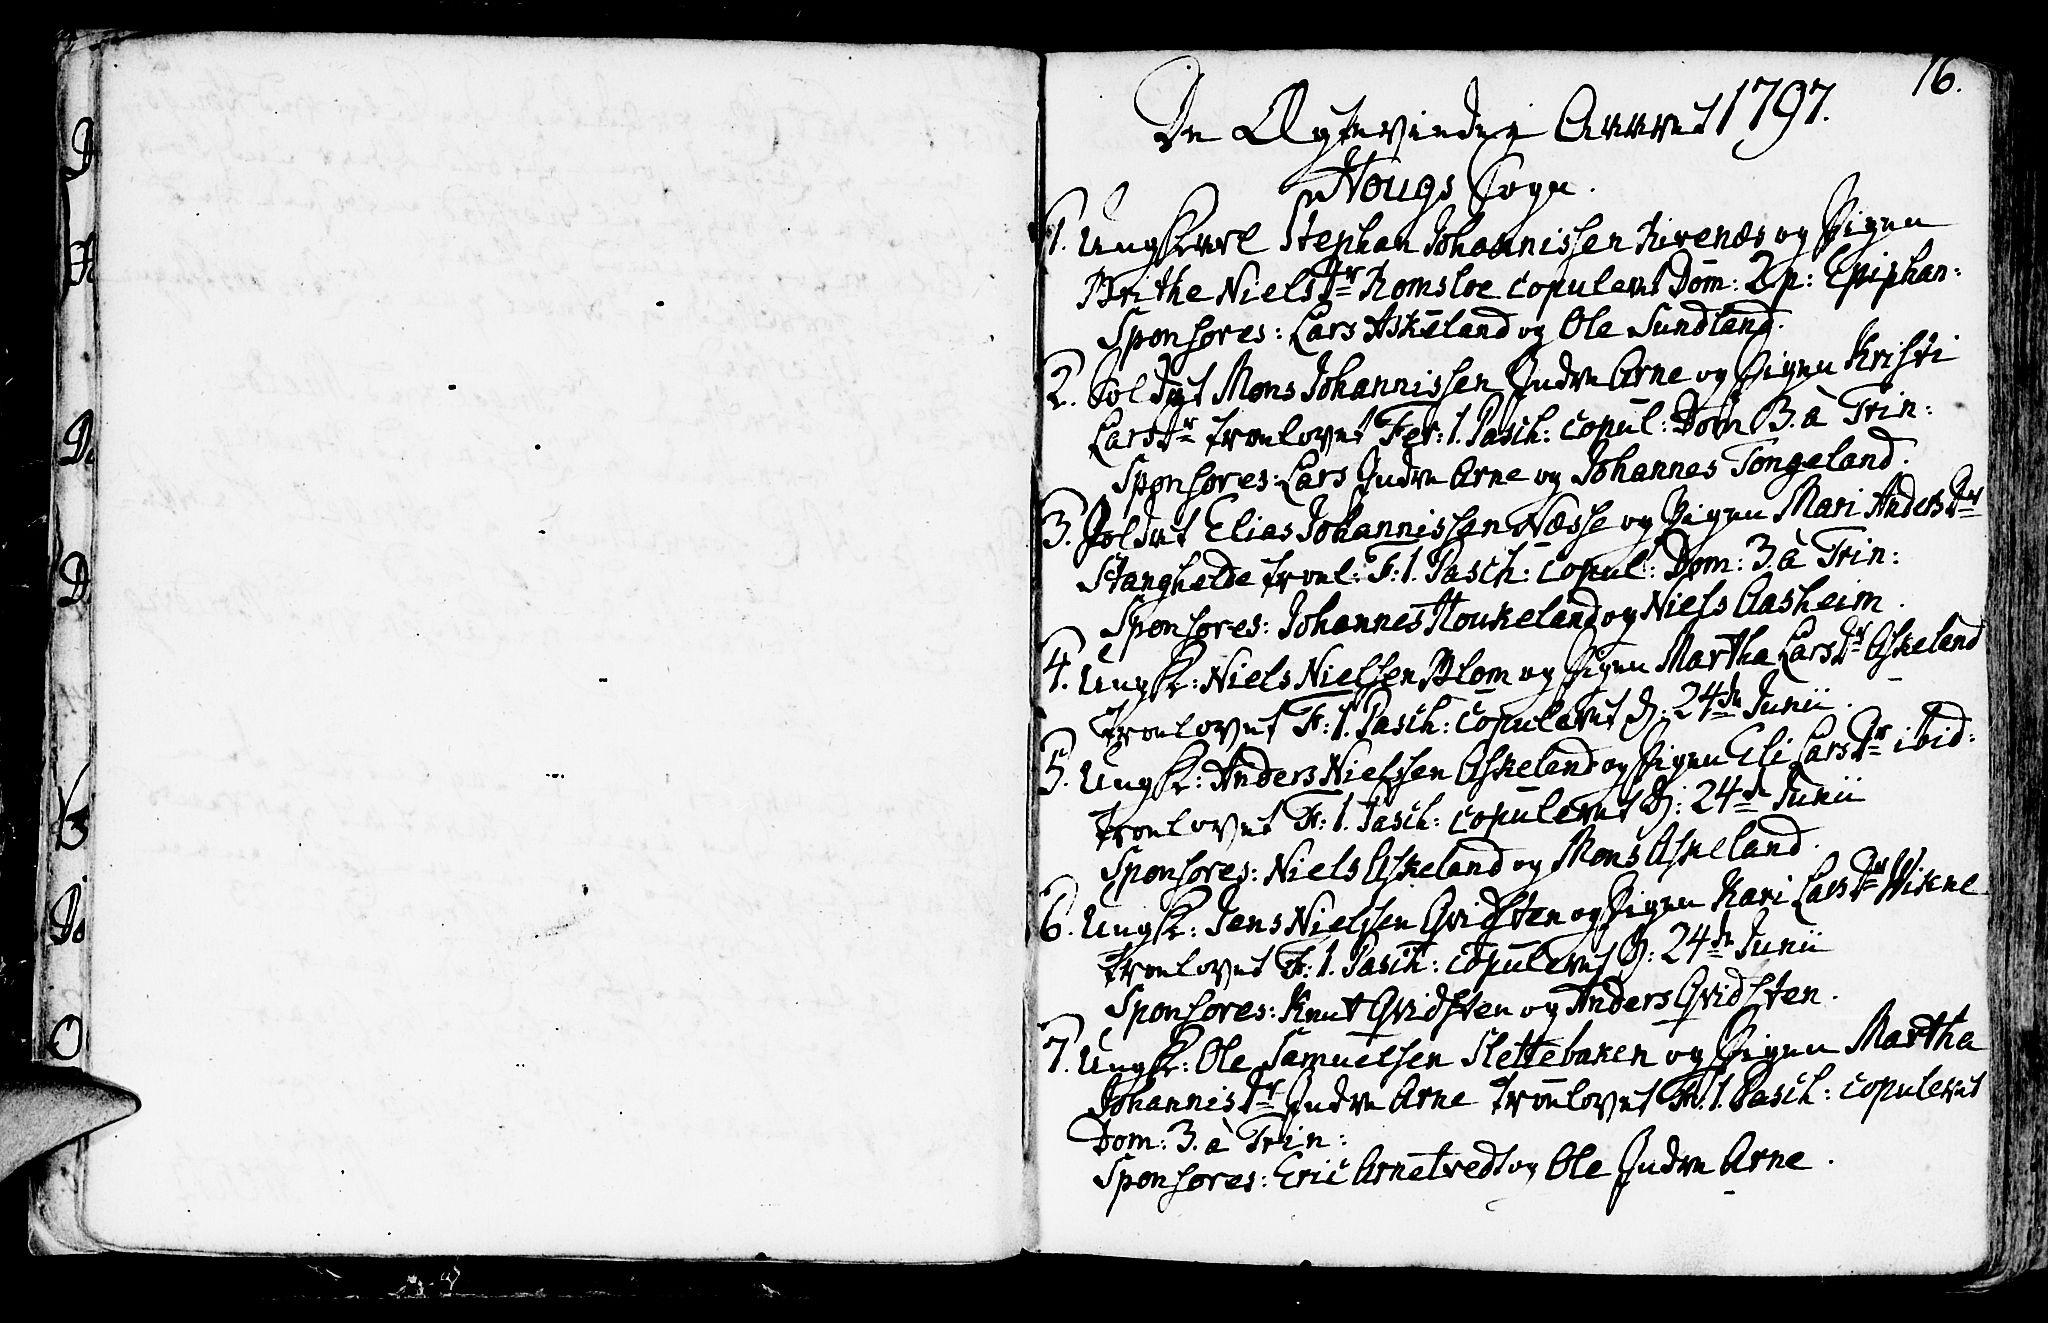 SAB, Haus sokneprestembete, H/Haa: Ministerialbok nr. A 11, 1796-1816, s. 16